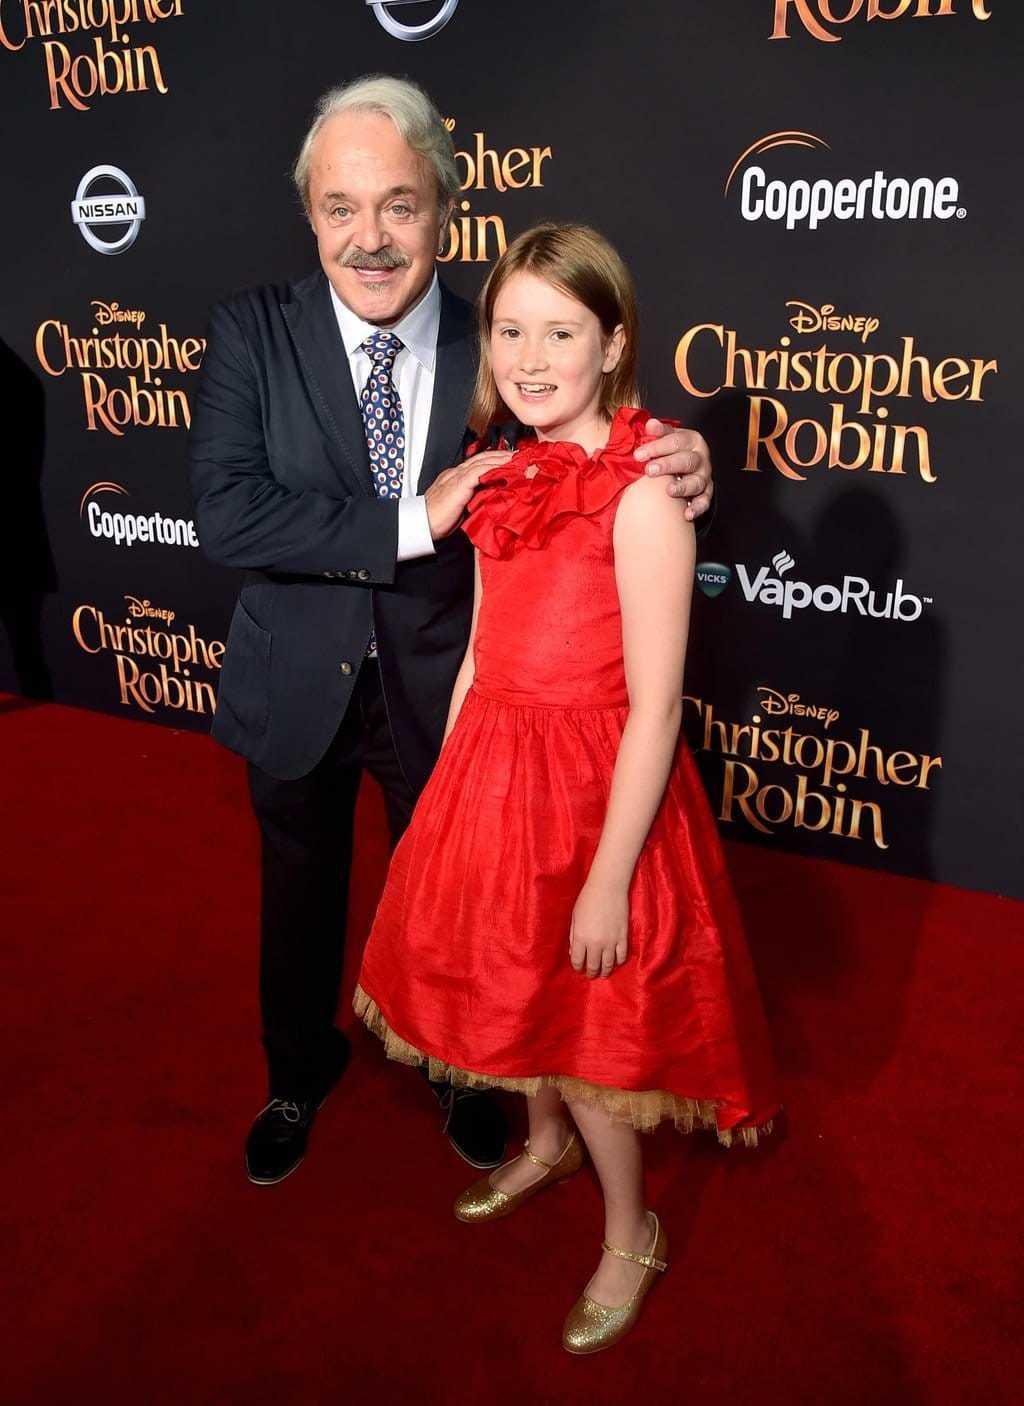 Bronte Carmichael and Jim Cummings at Disney's Red Carpet for Christopher Robin